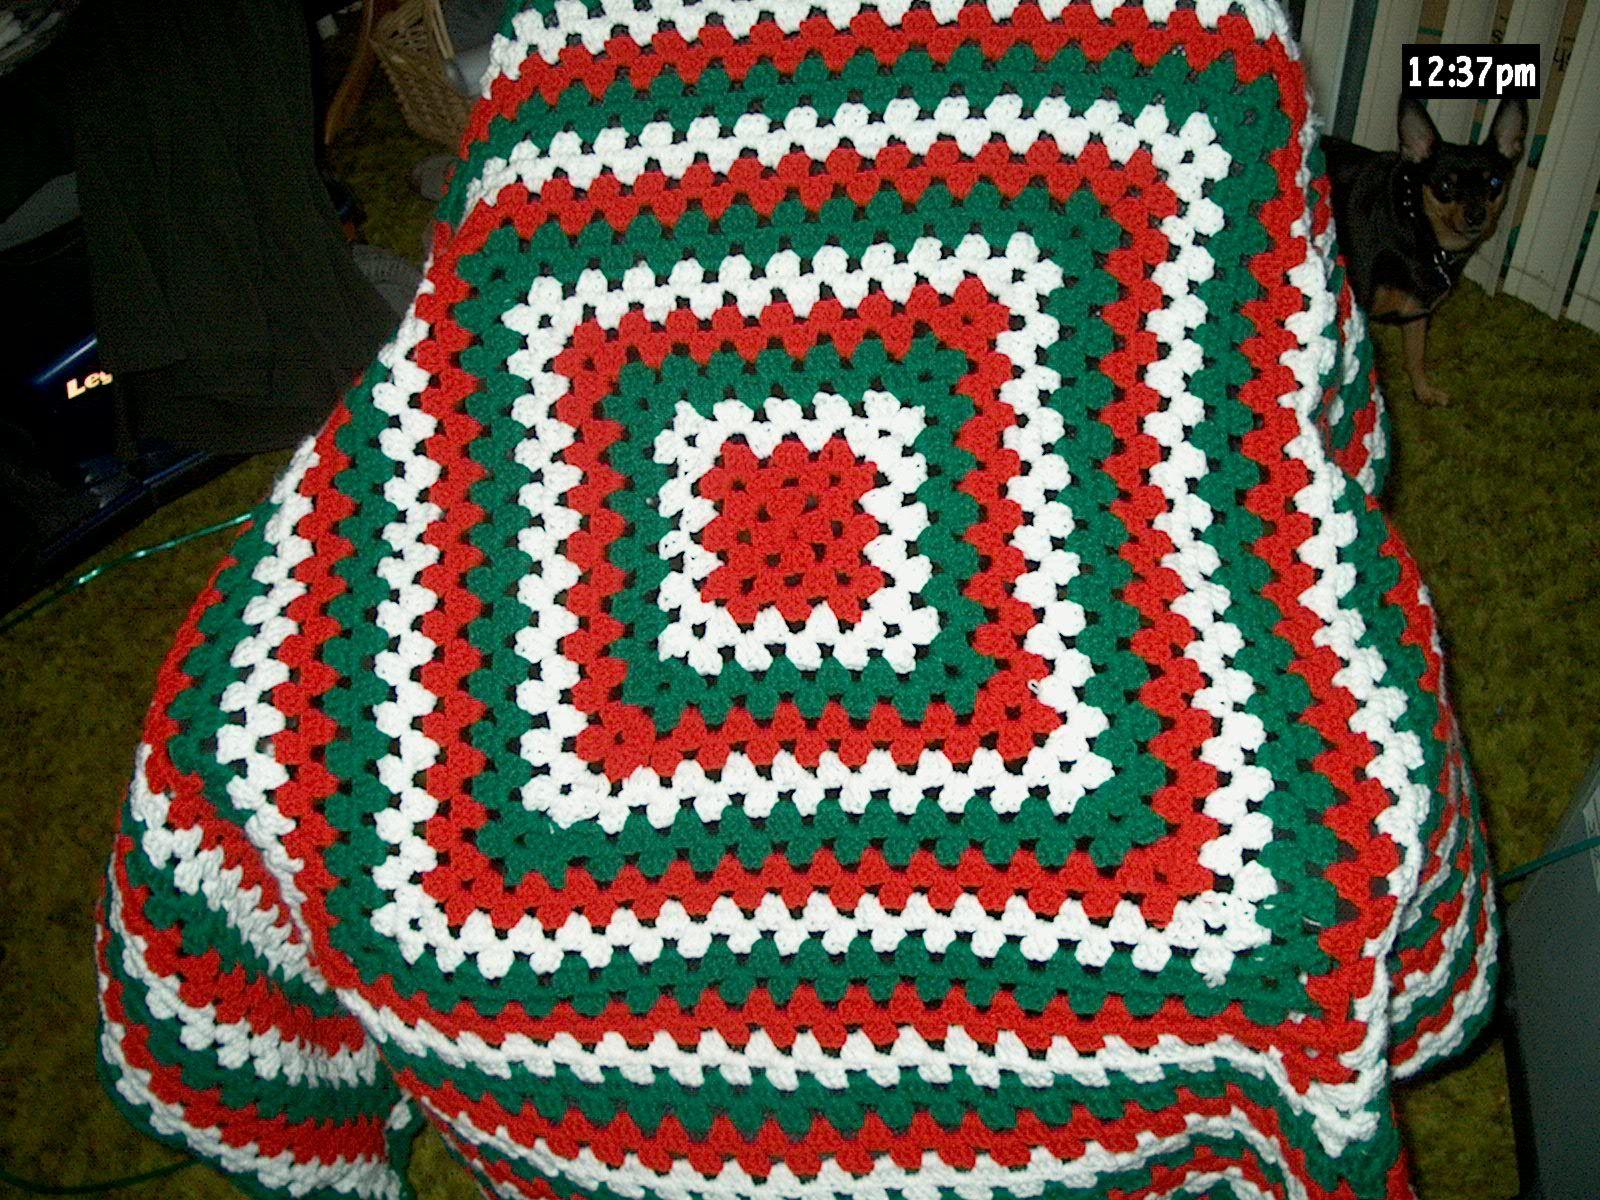 Crochet Afghan Patterns Christmas : I crocheted a Christmas Afghan! christmas crochet ...